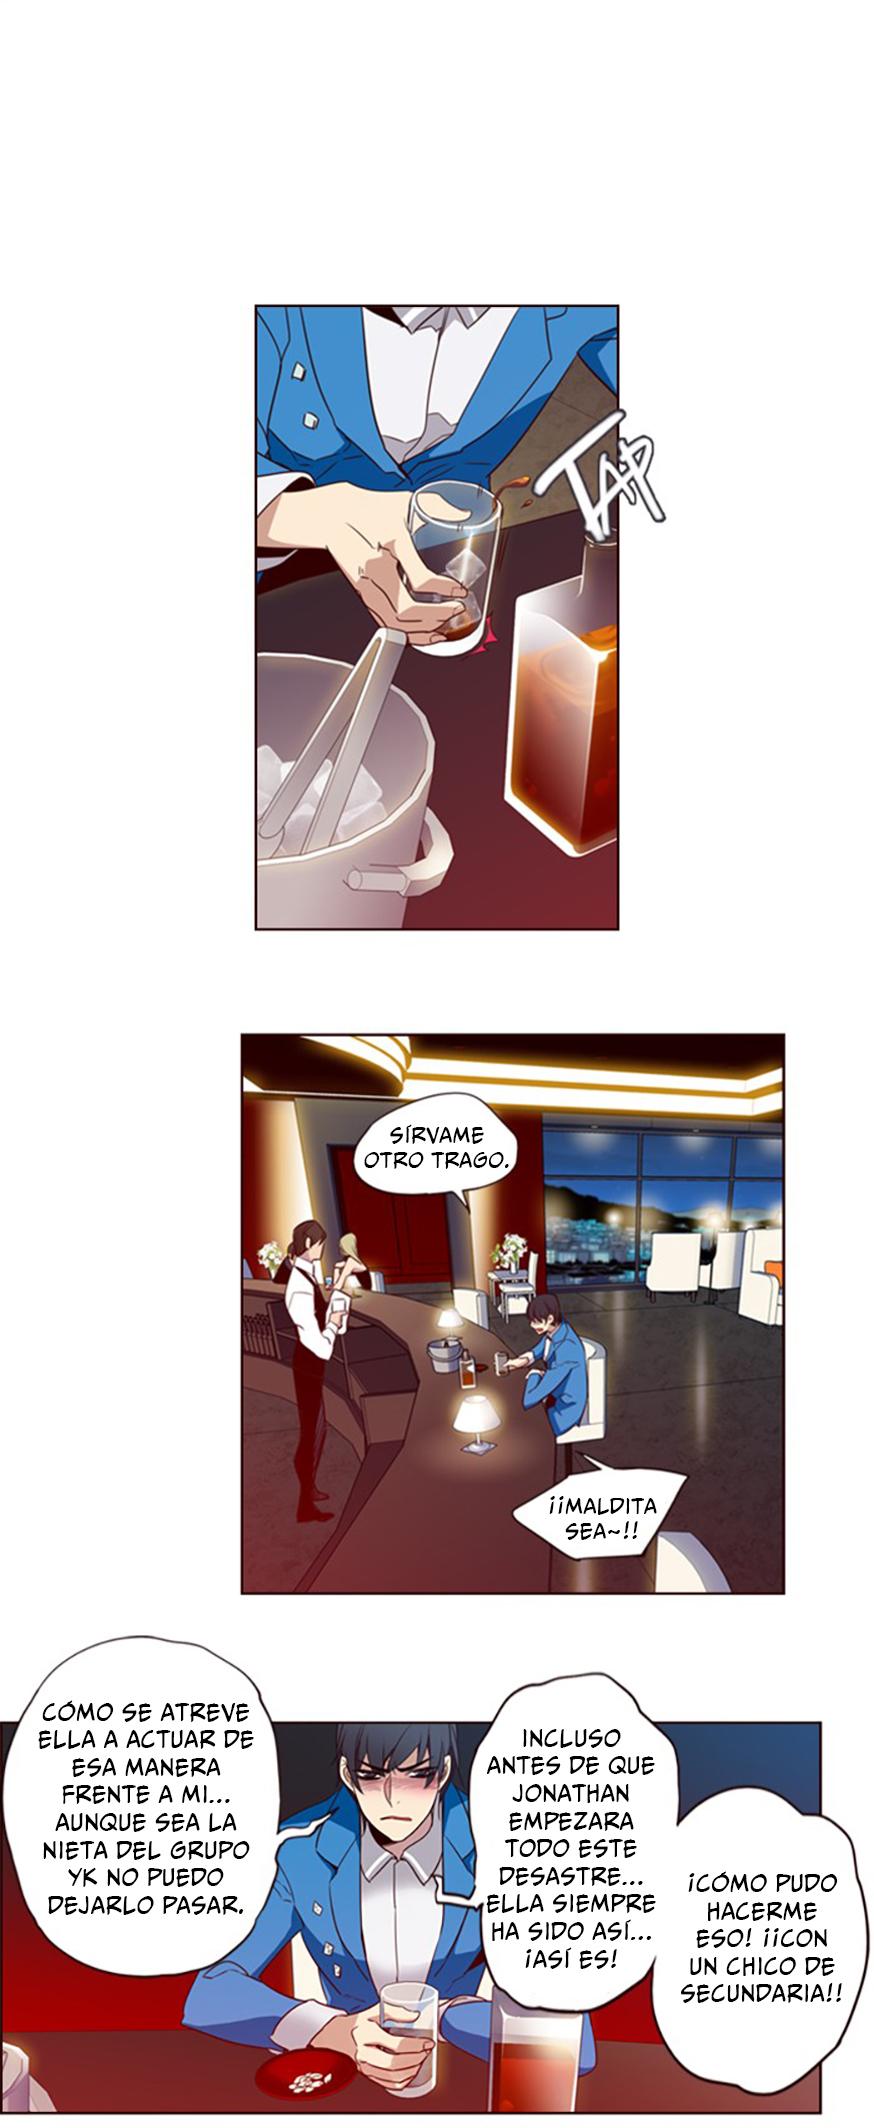 http://c5.ninemanga.com/es_manga/32/416/380557/7c1bfe1282337cd8f1ec7182e1e1deb8.jpg Page 5